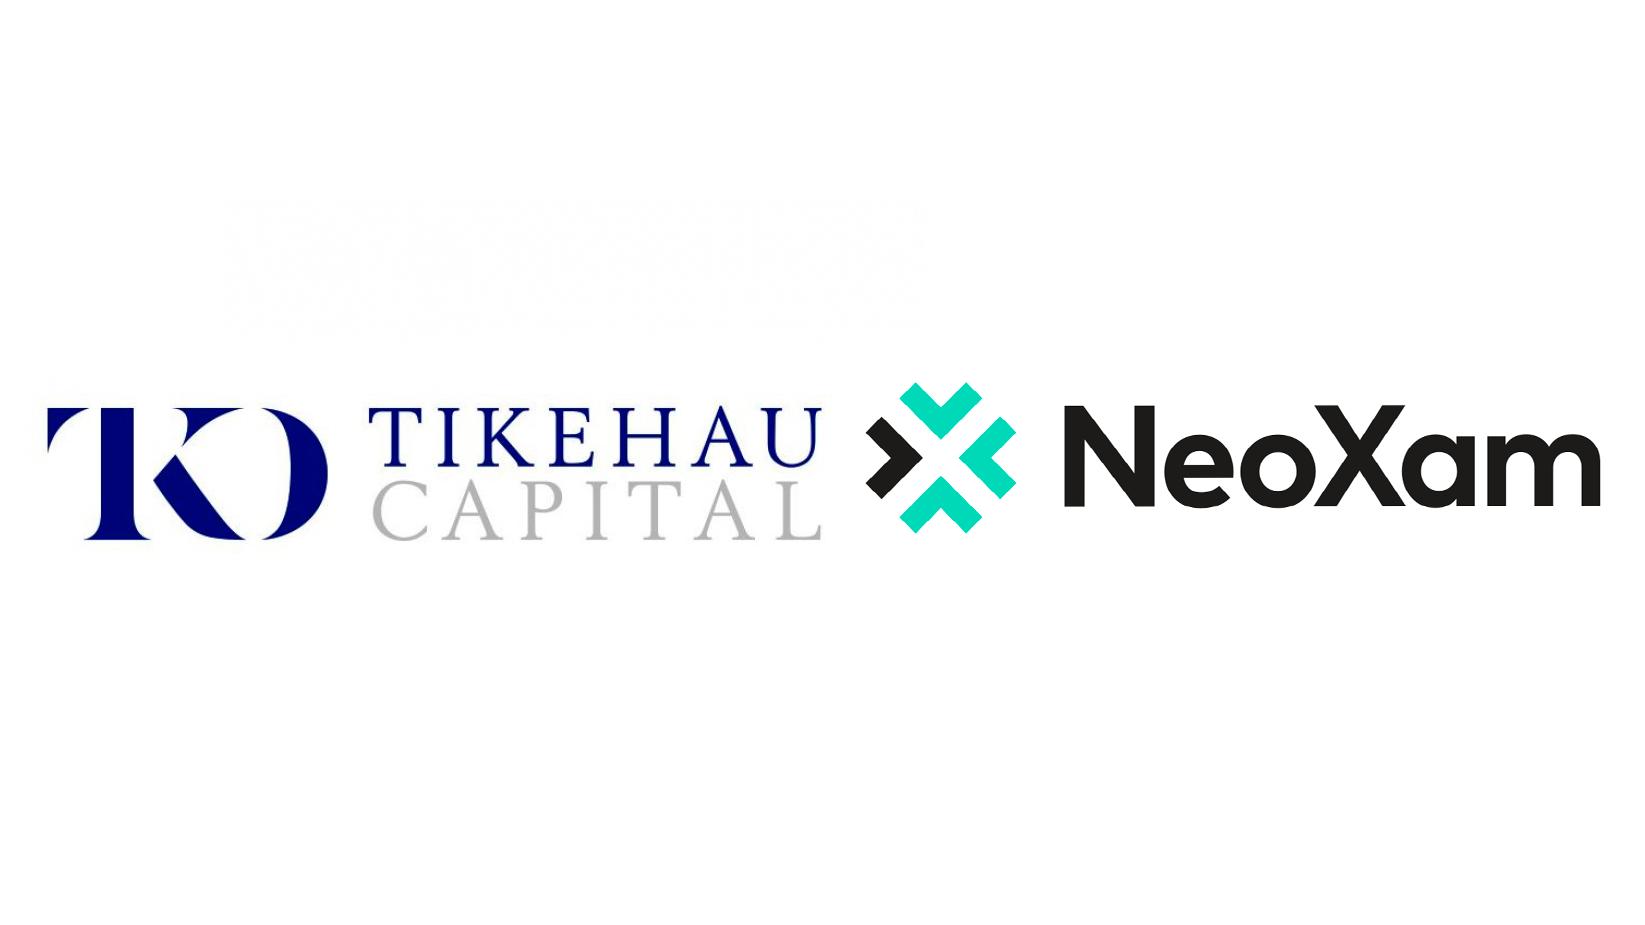 NeoXam's Datahub Platform Selected by Tikehau Capital to Support Transformation Program